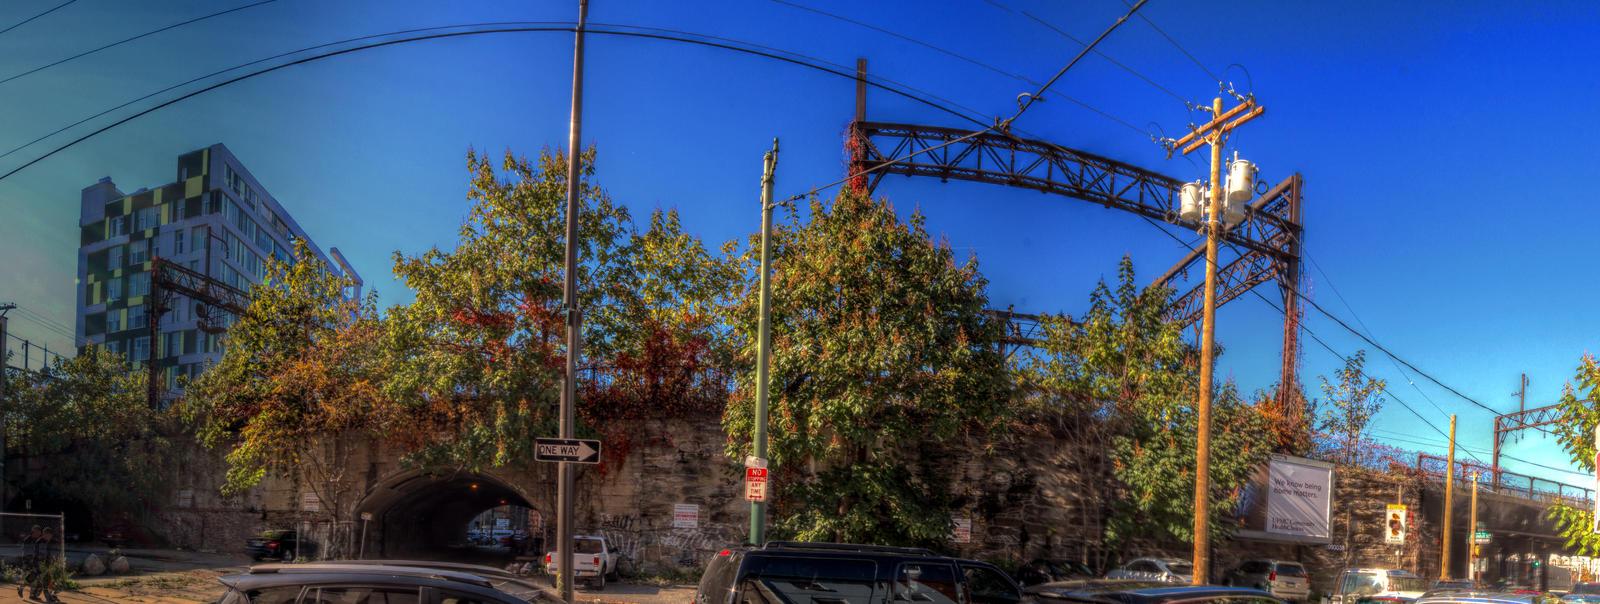 Panorama 3834 hdr pregamma 1 mantiuk06 contrast ma by bruhinb